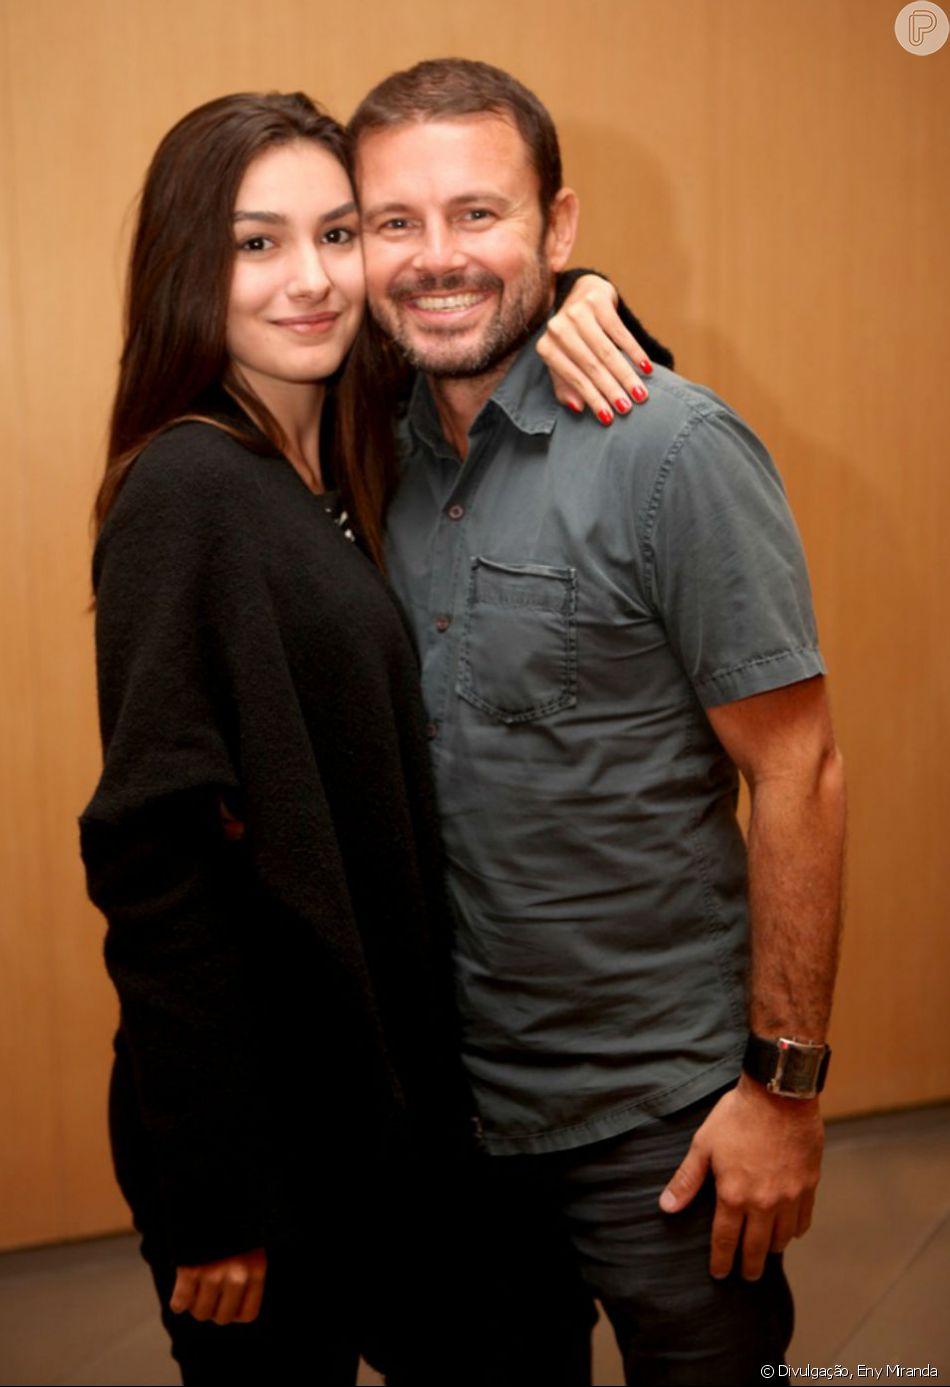 Marina Moschen terminou relacionamento com economista Daniel Nigri